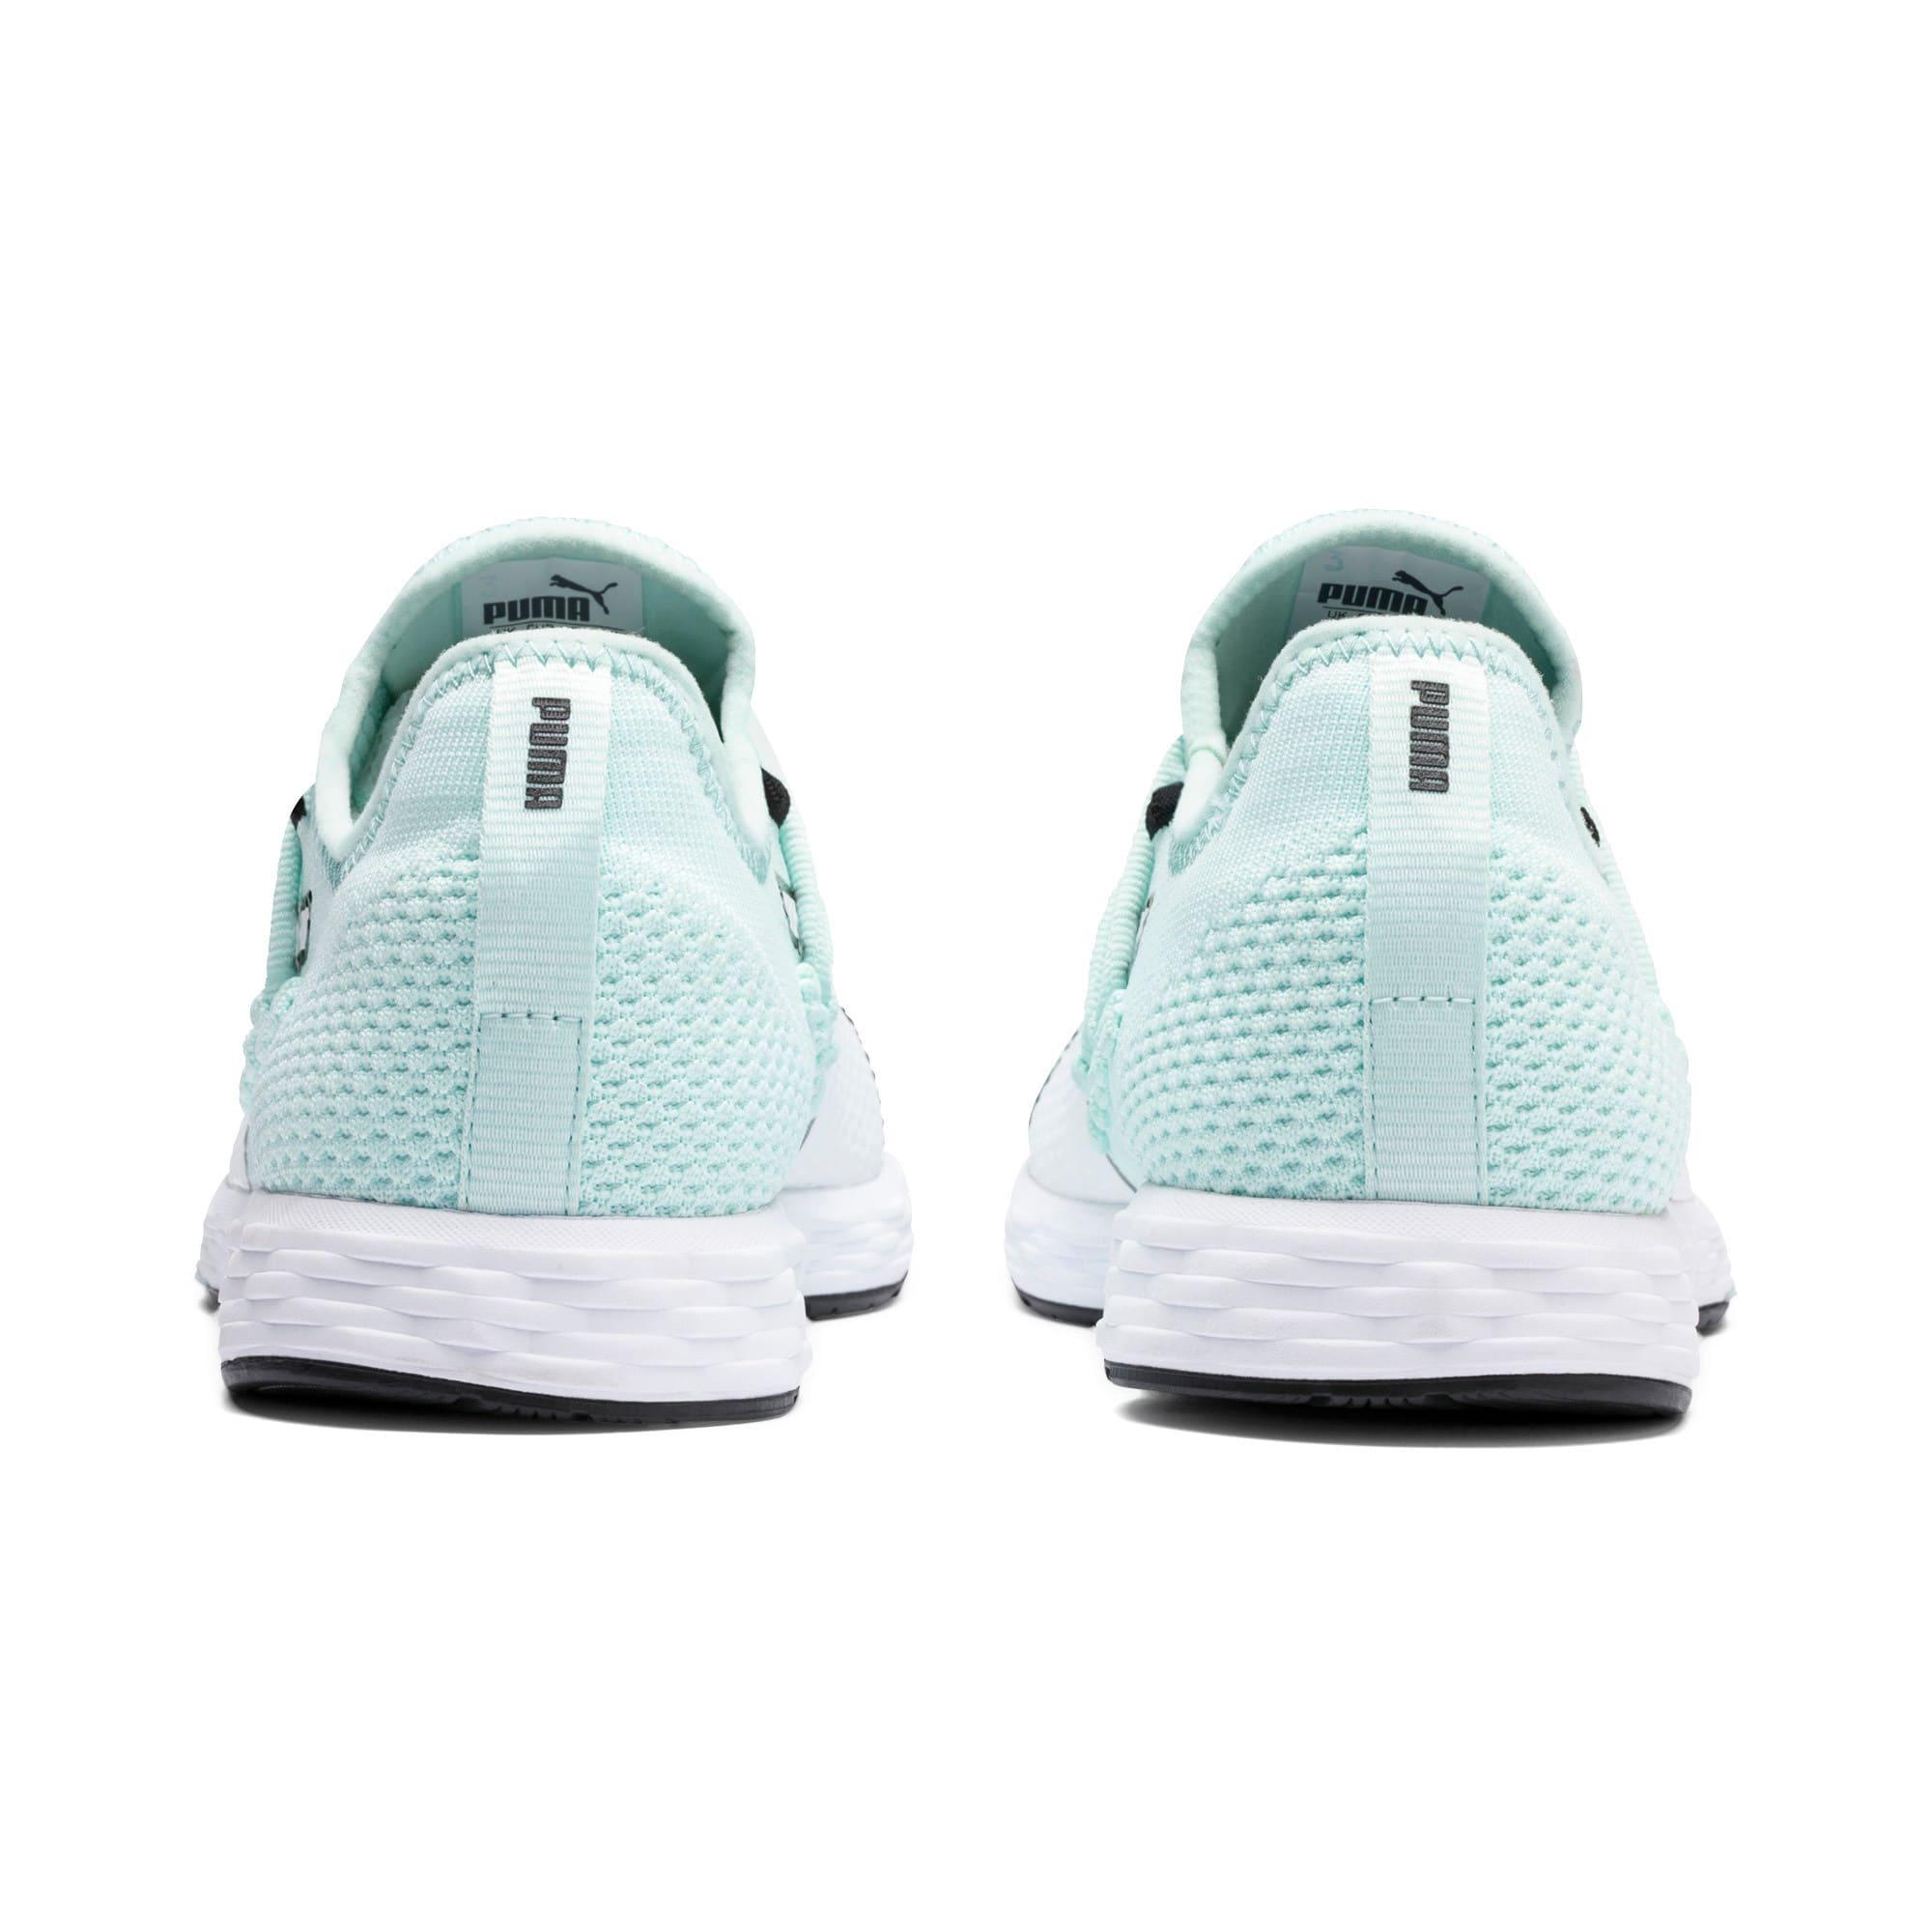 Thumbnail 3 of SPEED 300 RACER Women's Running Shoes, Fair Aqua-White-Black, medium